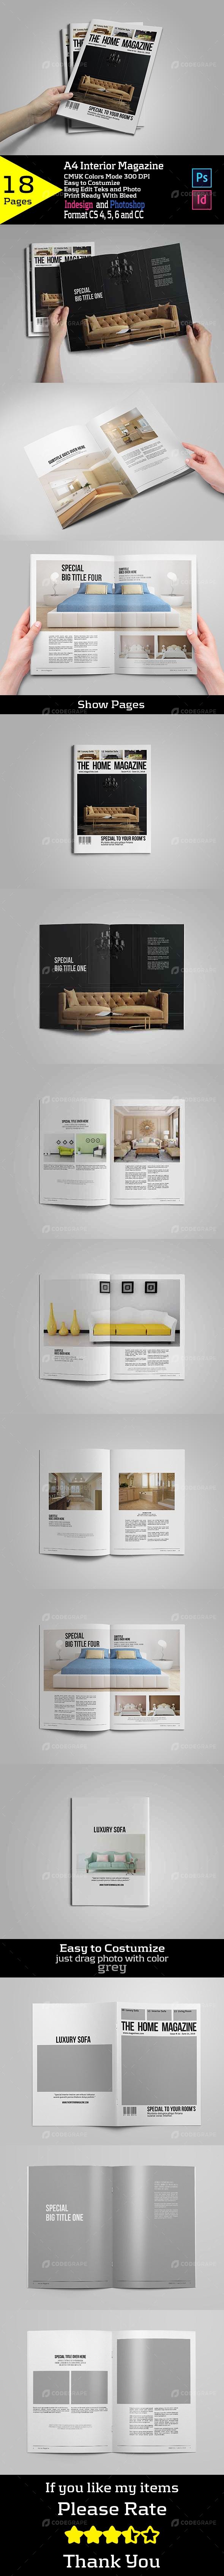 A4 Interior Magazine